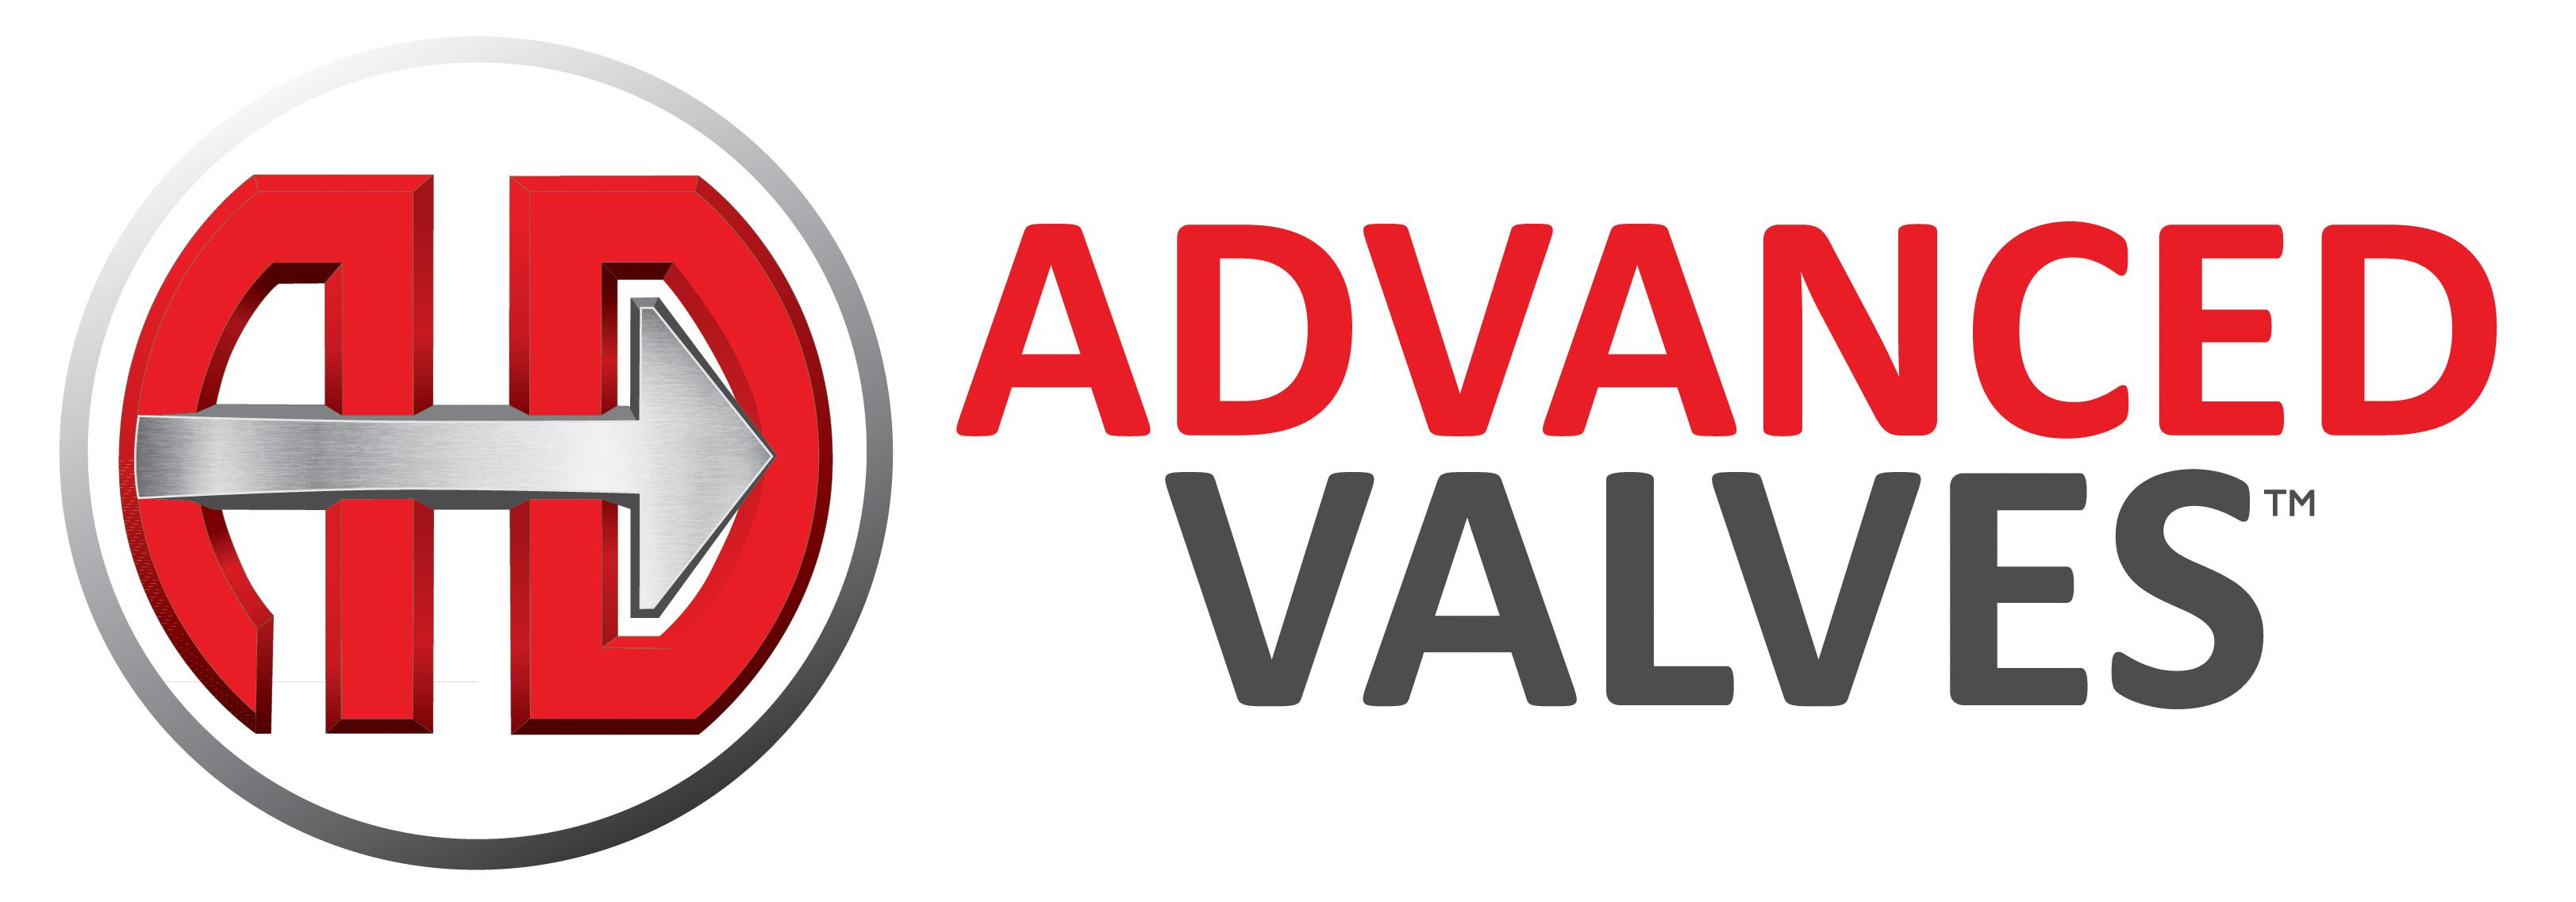 Advanced Valves